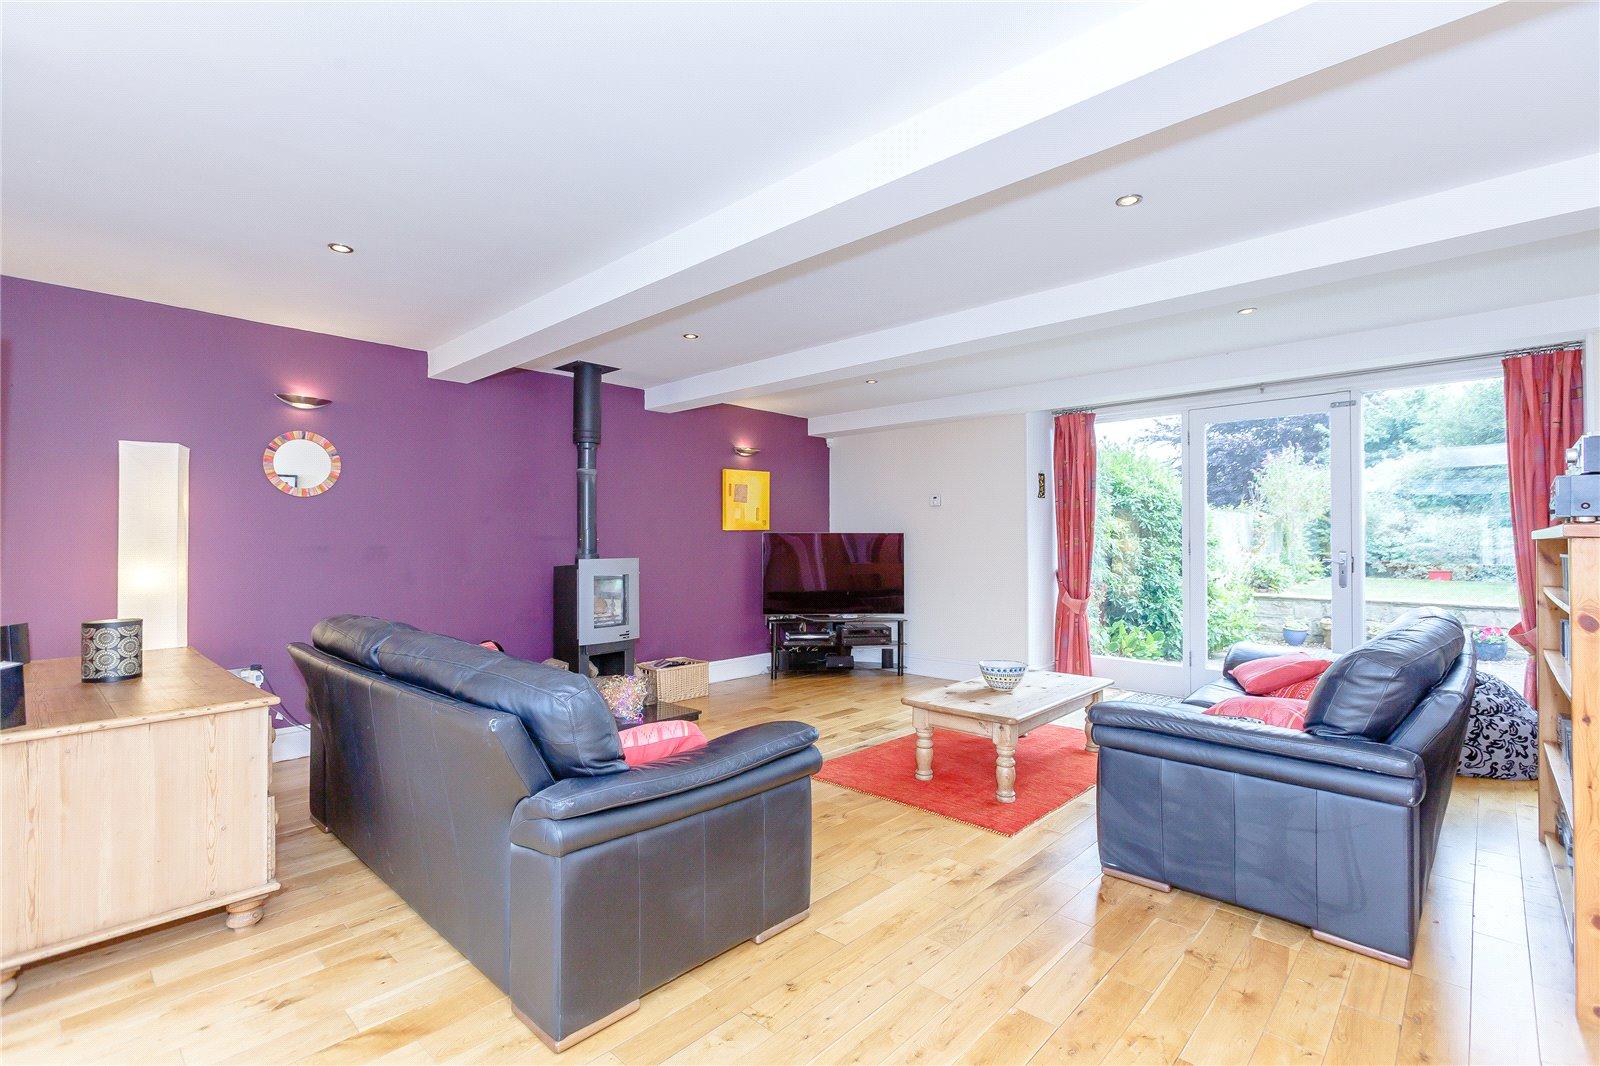 Property for sale in Harrogate, reception room